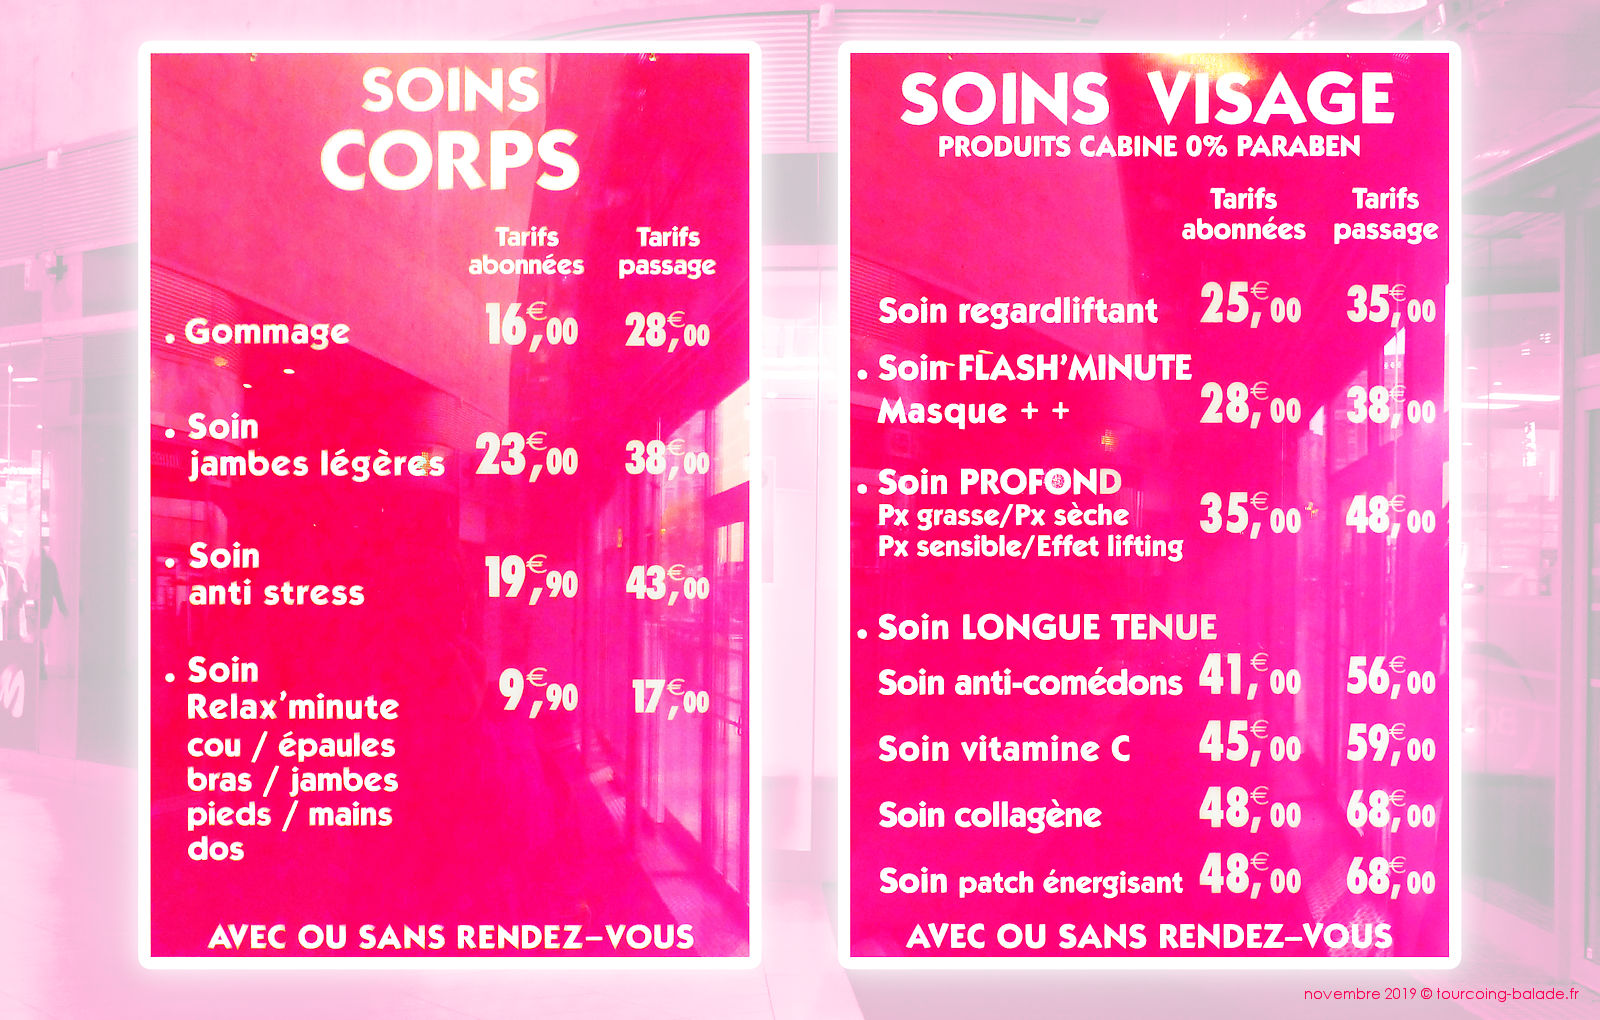 Body minute Tourcoing - Soins et Tarifs 2019